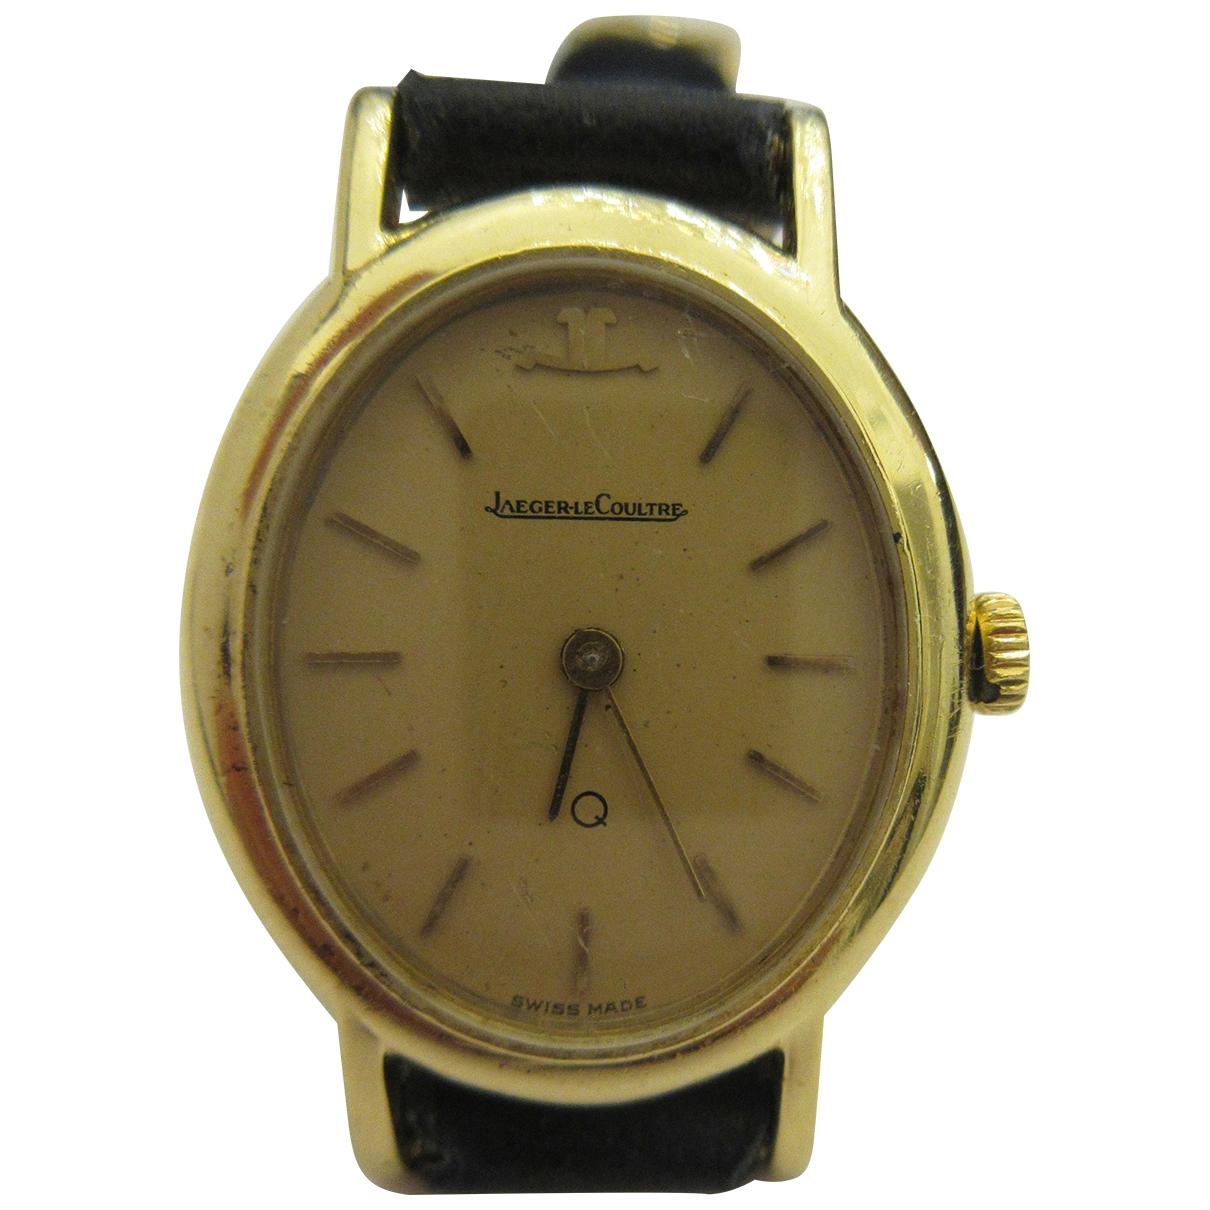 Jaeger-lecoultre Vintage Uhr in Gelbgold